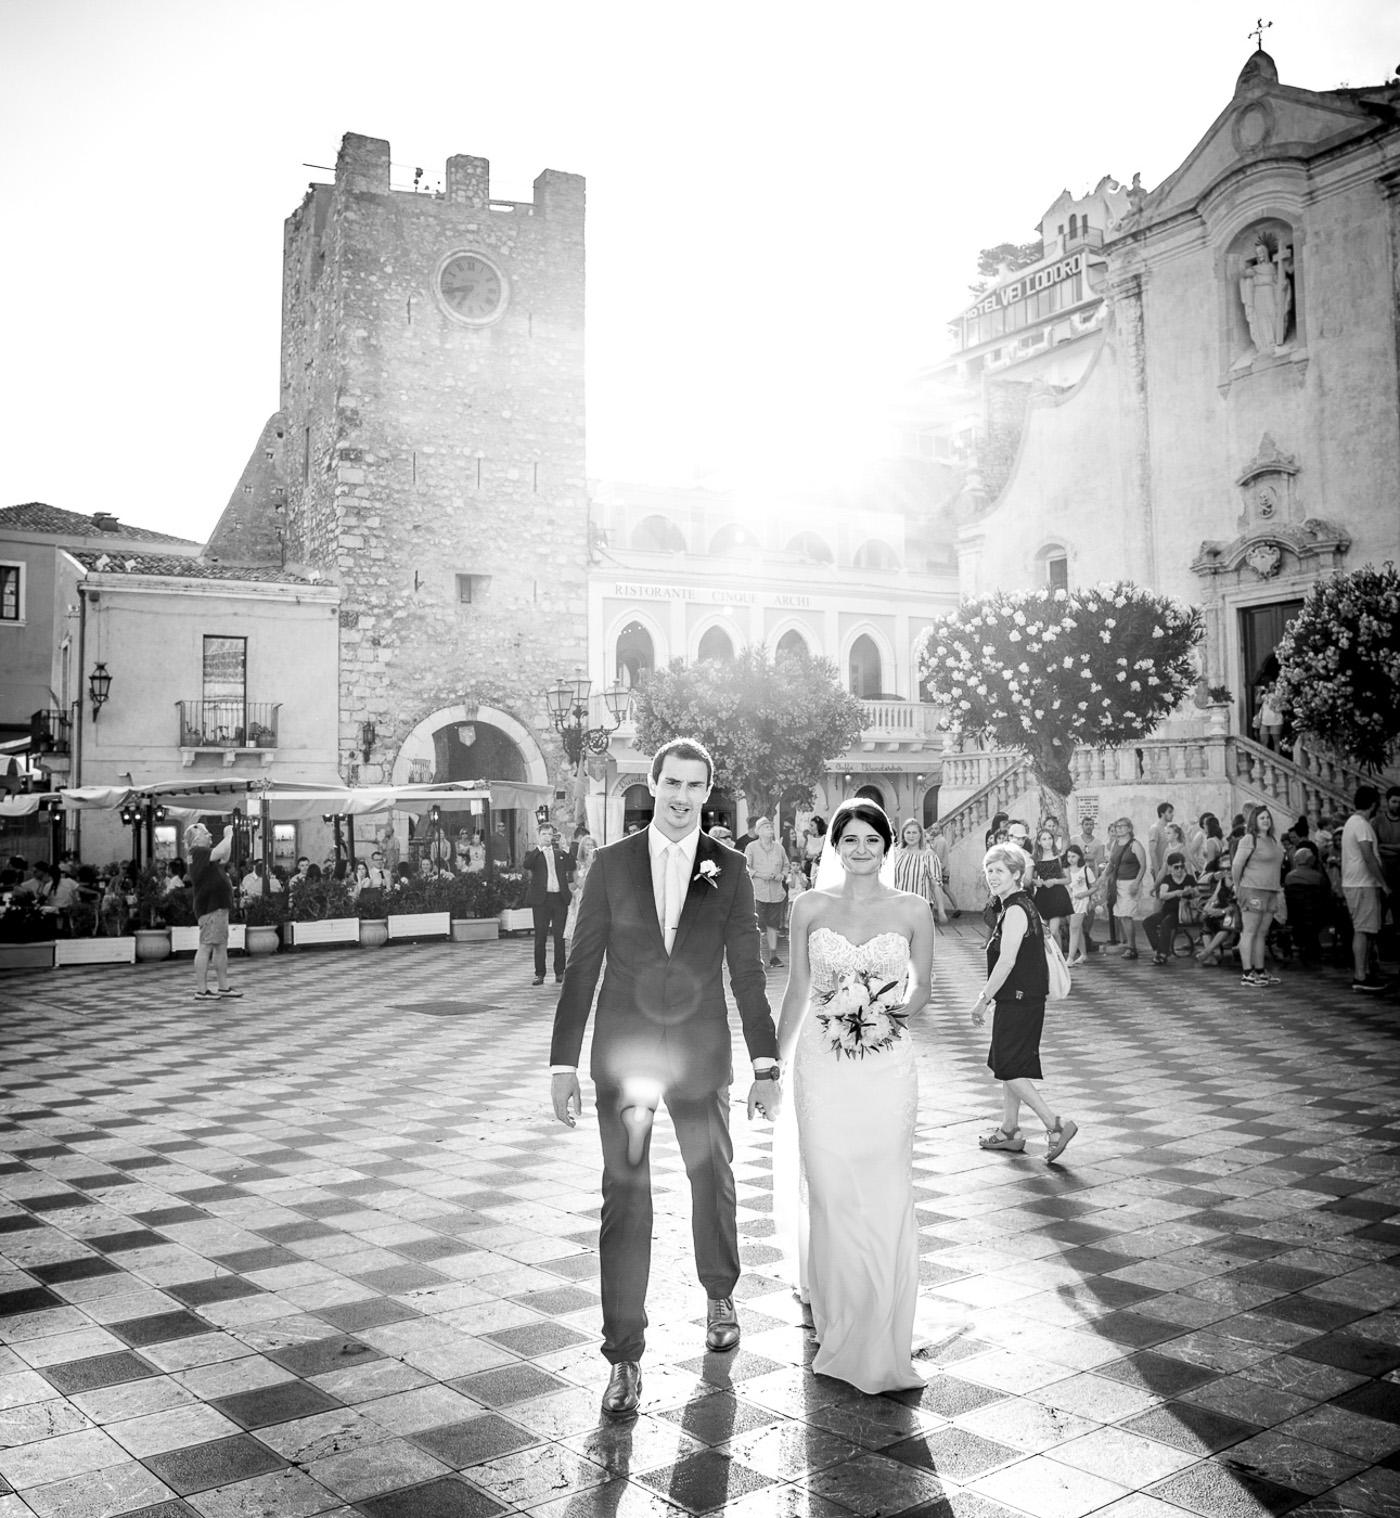 Matrimonio Irlandese Taormina_fotografo_matrimonio-palazzo-duchi-santo-stafano-foto-sposi-bacio-piazza-taormina-piazza-IXAprile